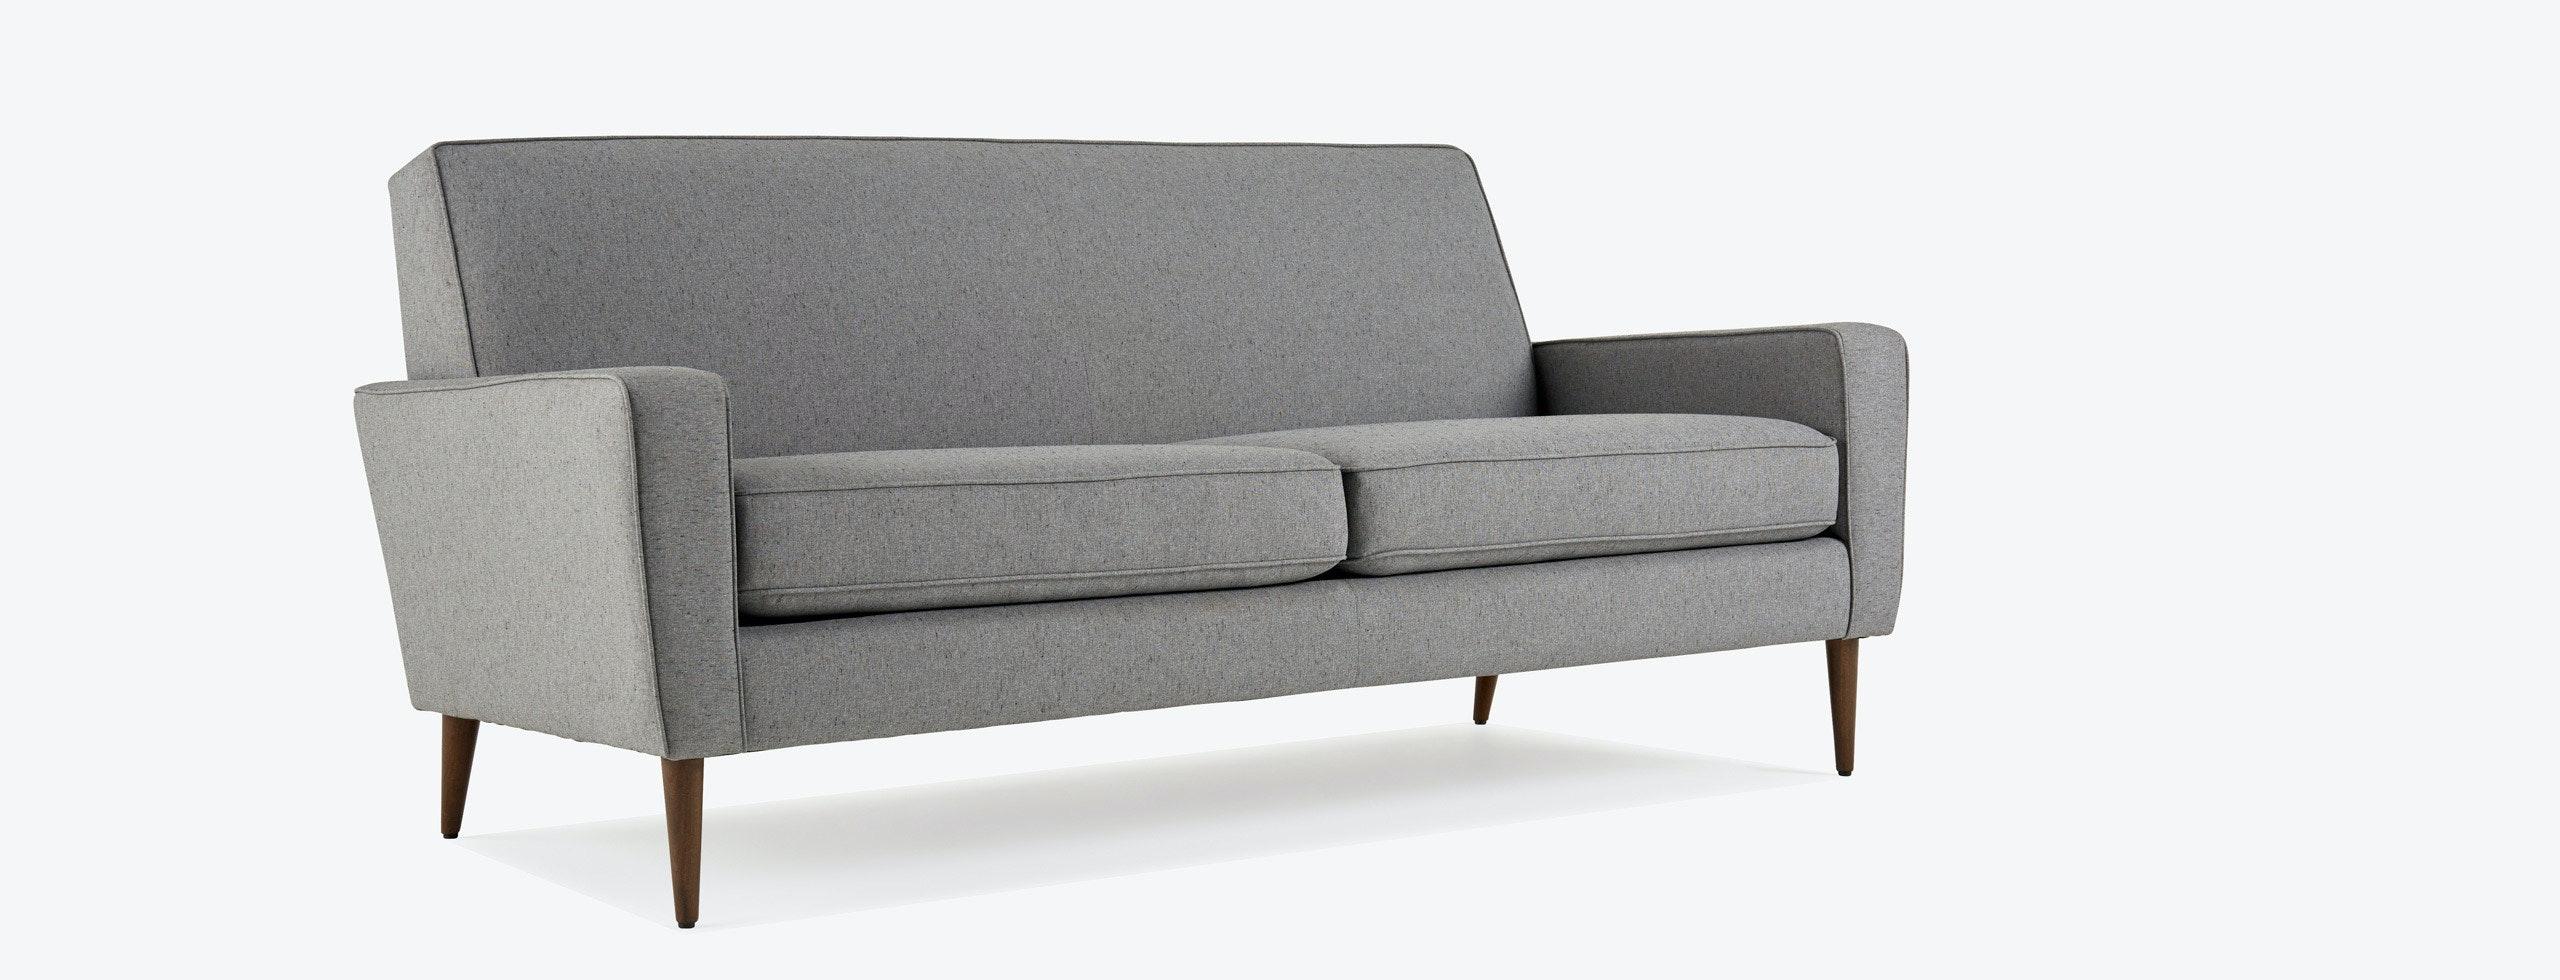 shown in Essence Ash Fabric